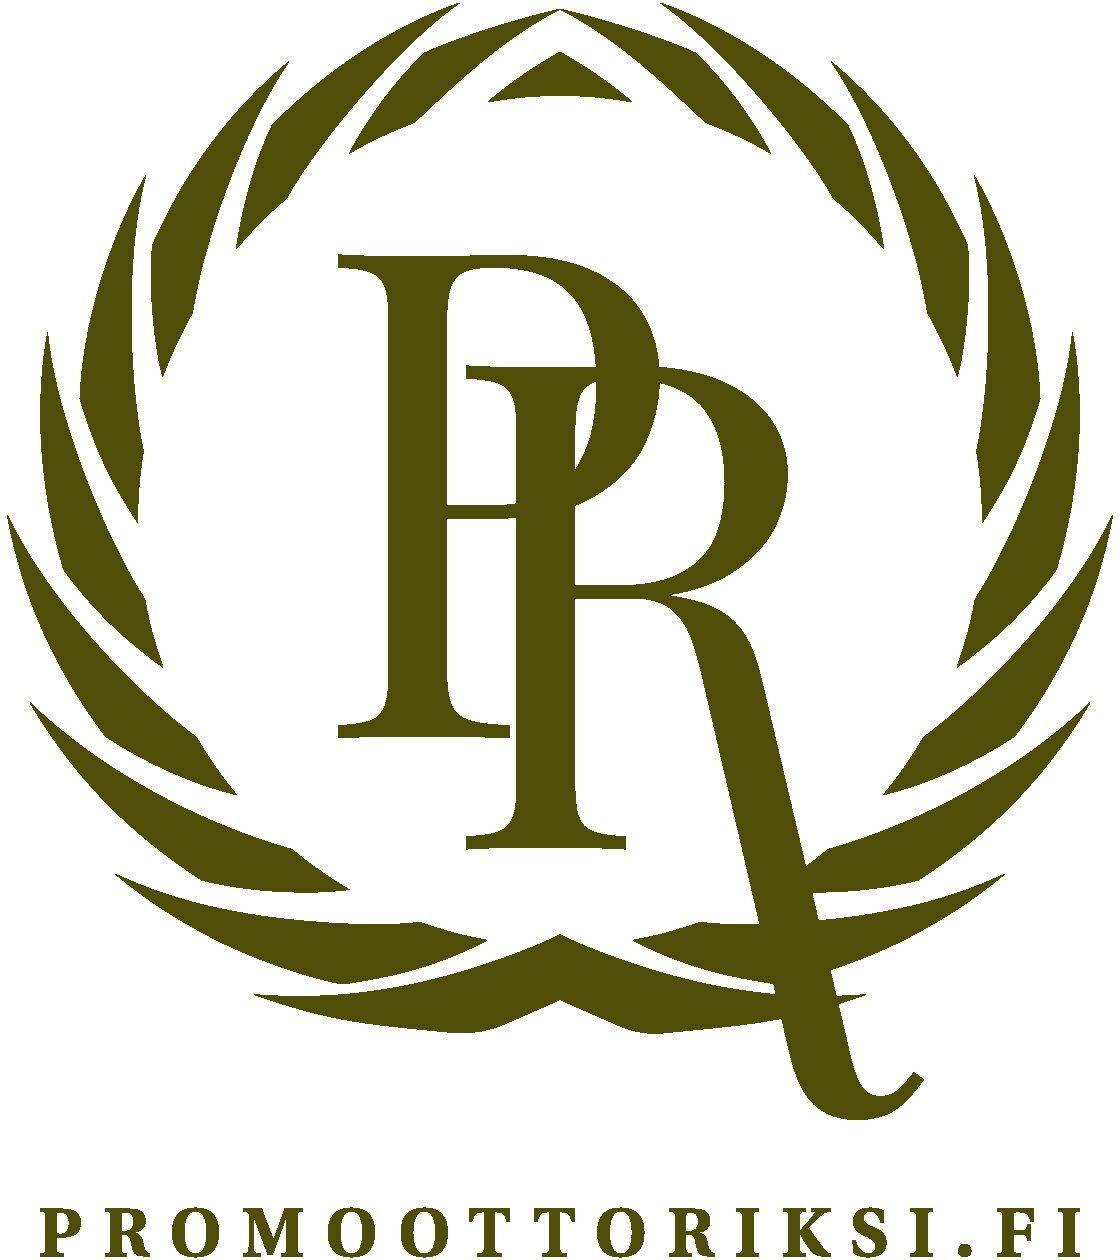 Promoottoriksi-fi-logo-ja-osoite-pdf